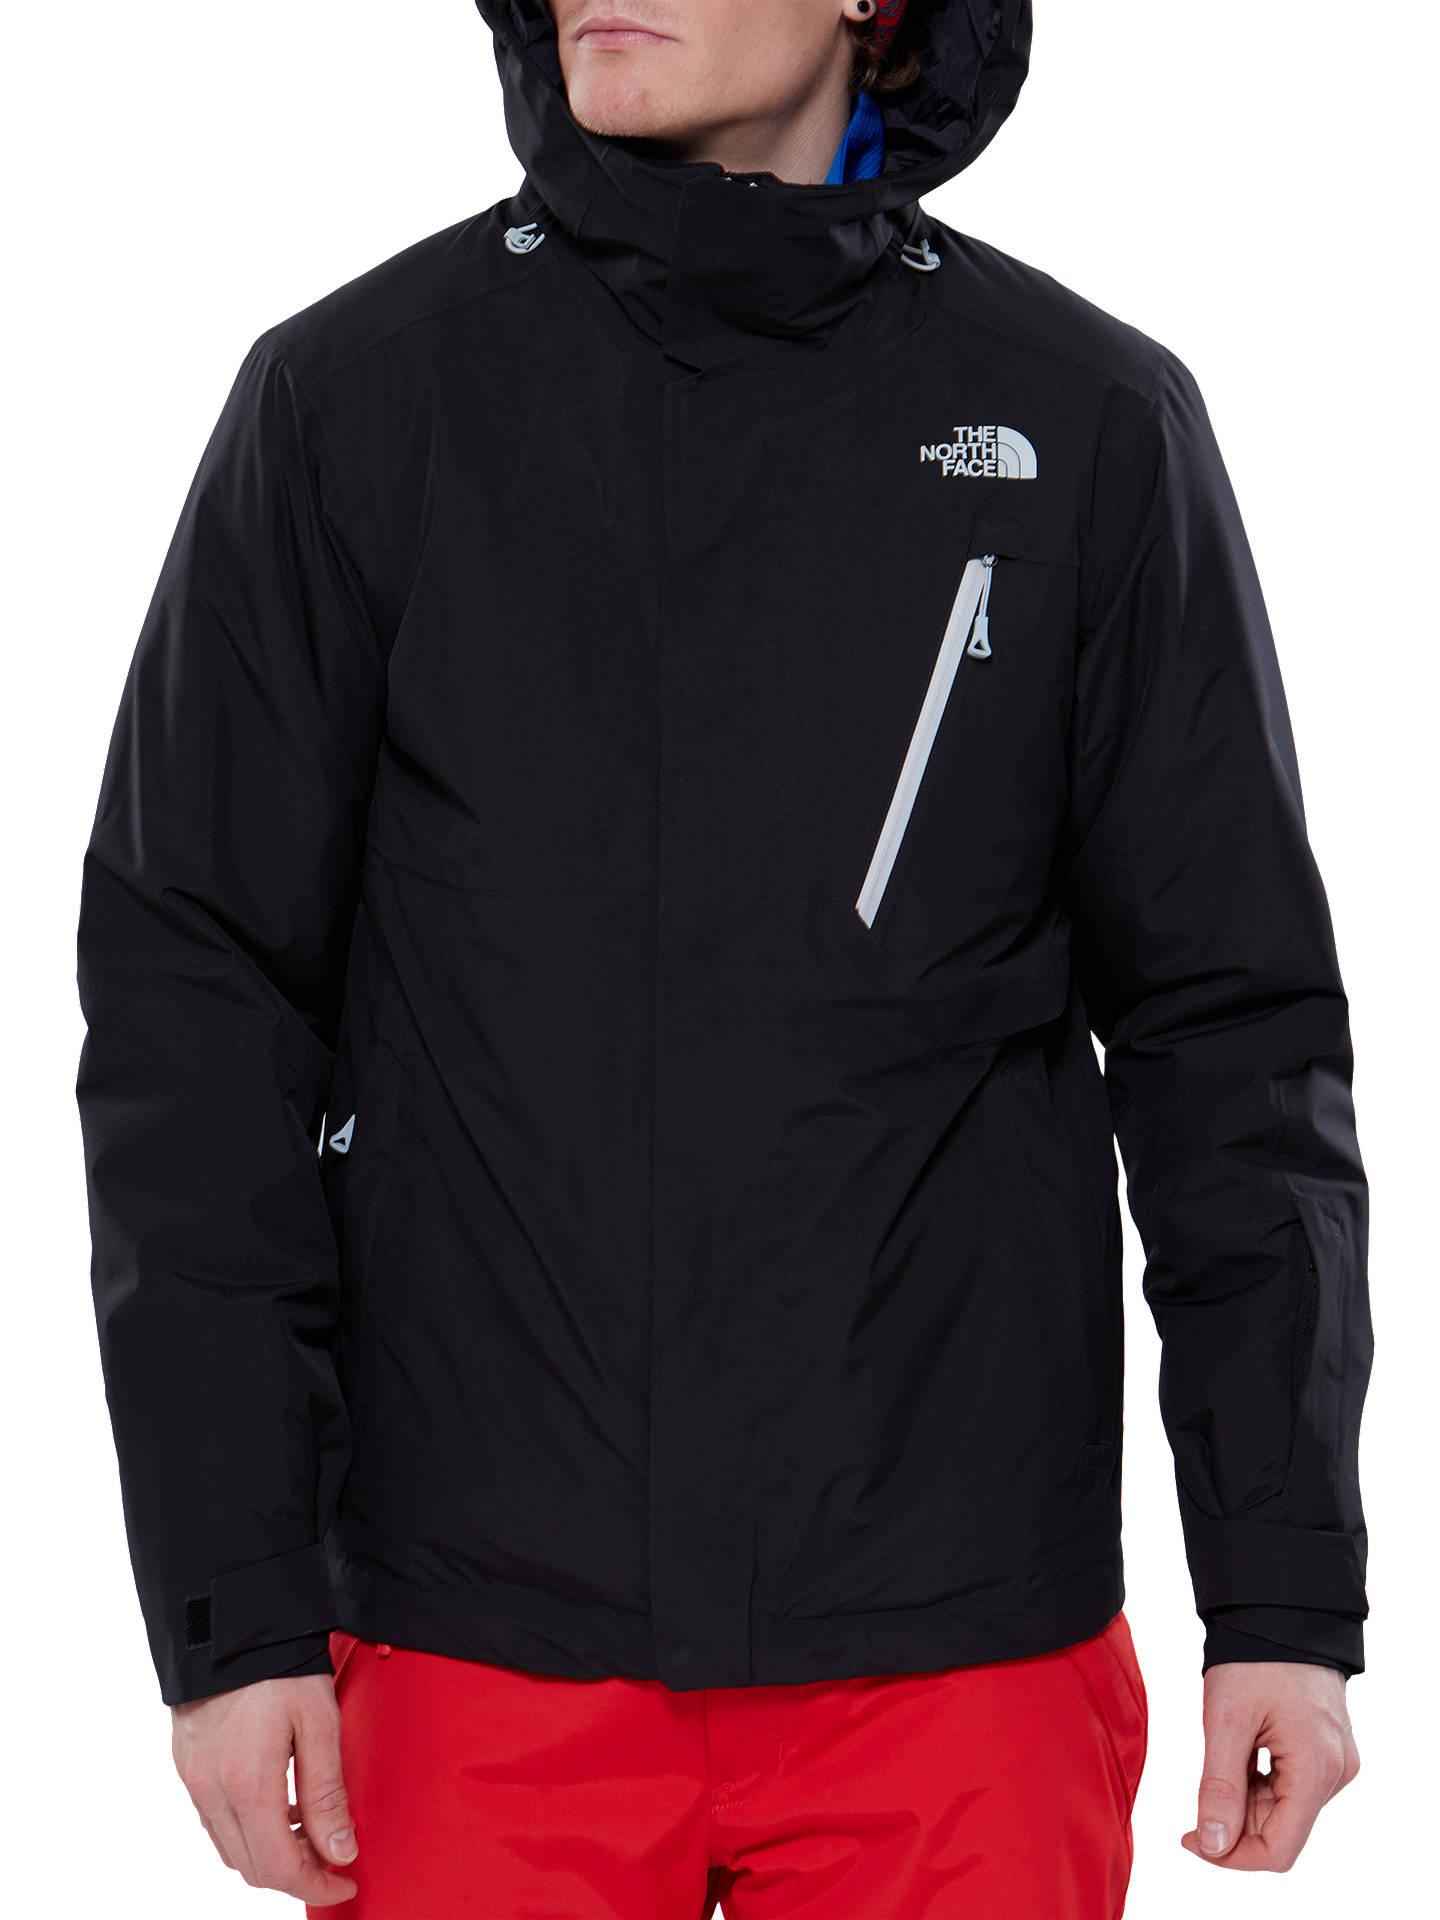 833349c46 The North Face Descendit Waterproof Men's Jacket, Black at John ...